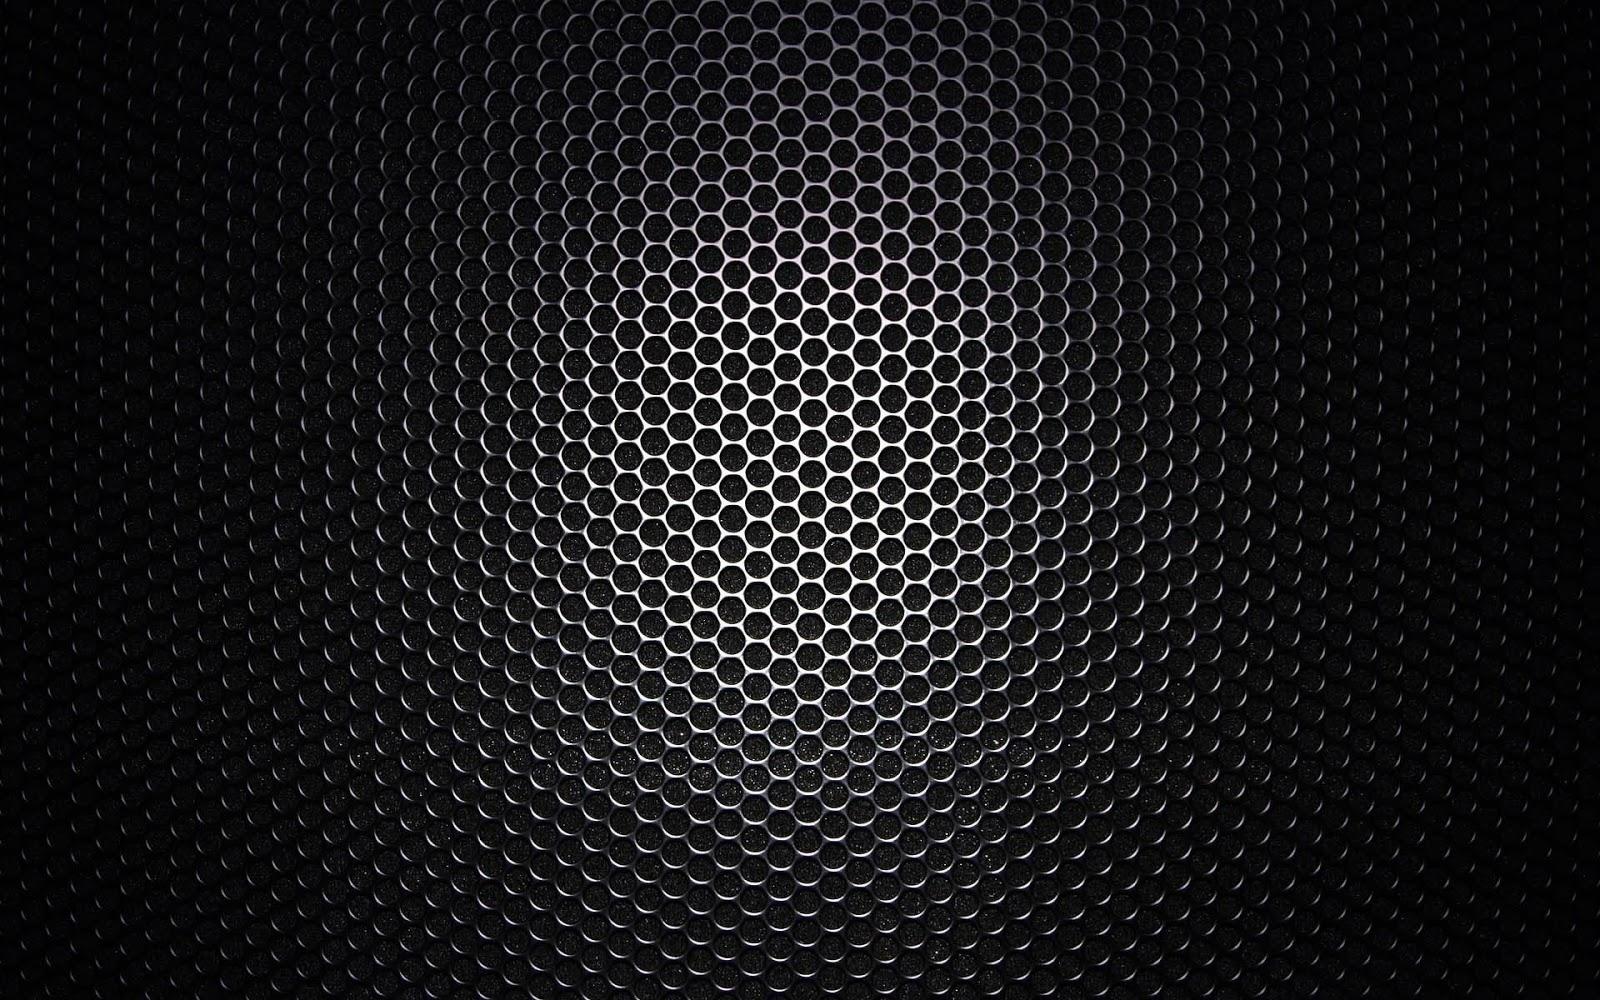 Tumblr Desktop Backgrounds